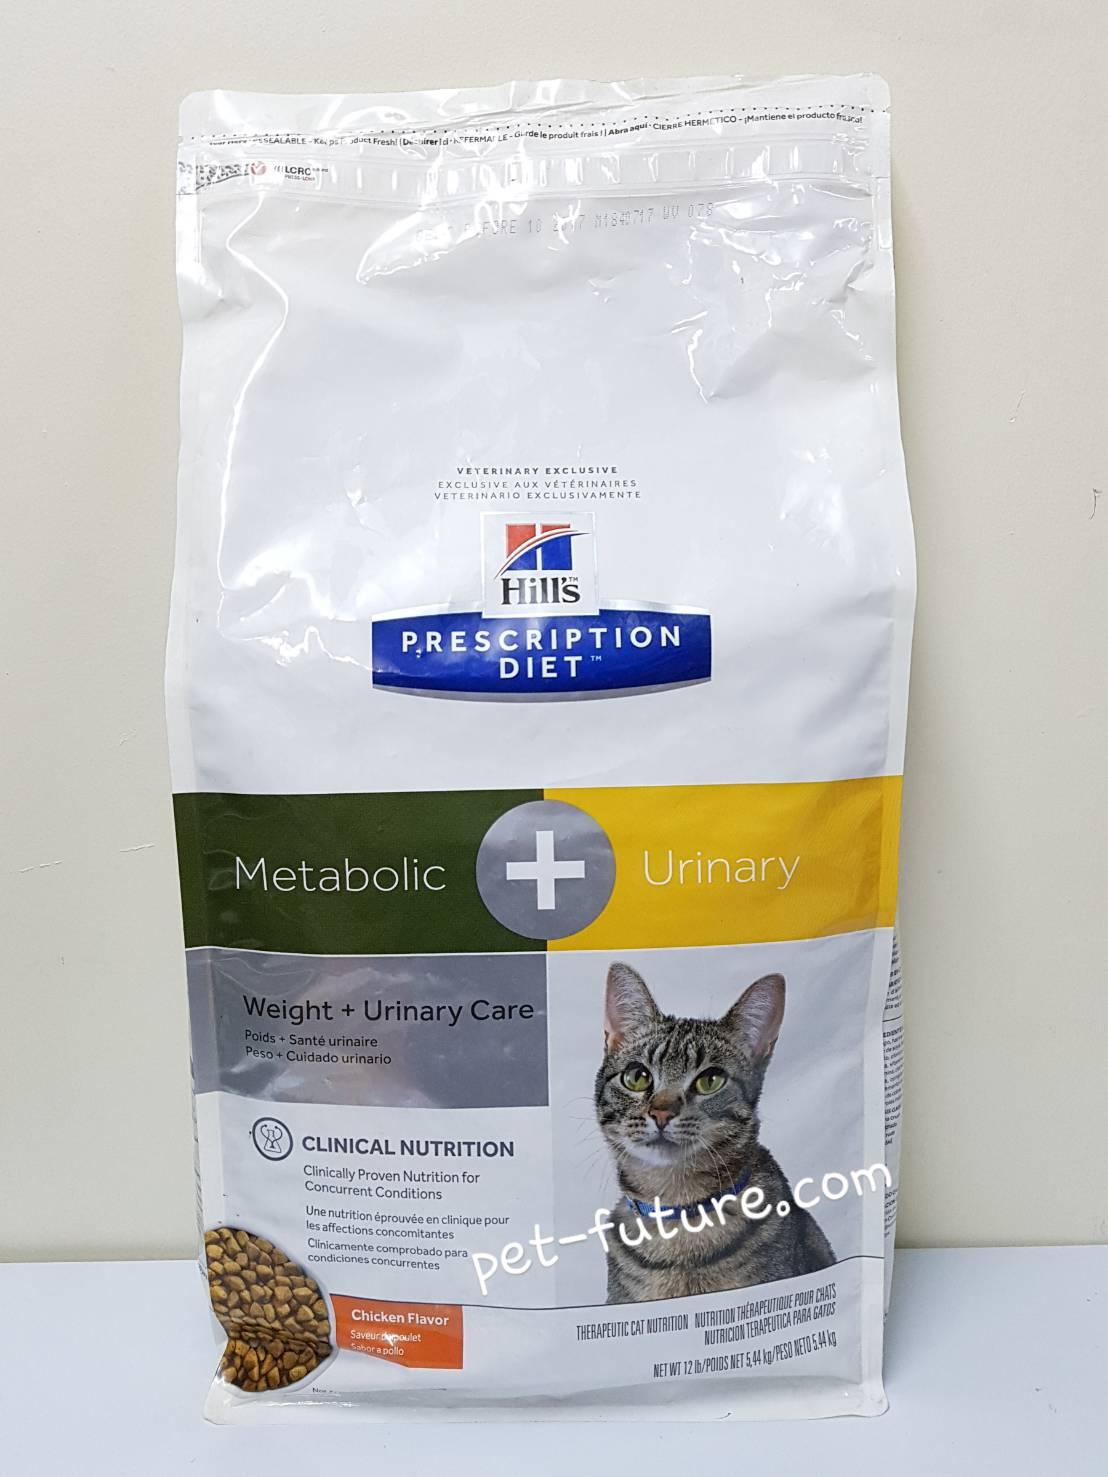 Metabolic+Urinary สำหรับลดน้ำหนักและกระเพาะปัสสาวะอักเสบ 5.44 kg. _Exp 10/17 ราคาแนะนำจร้า